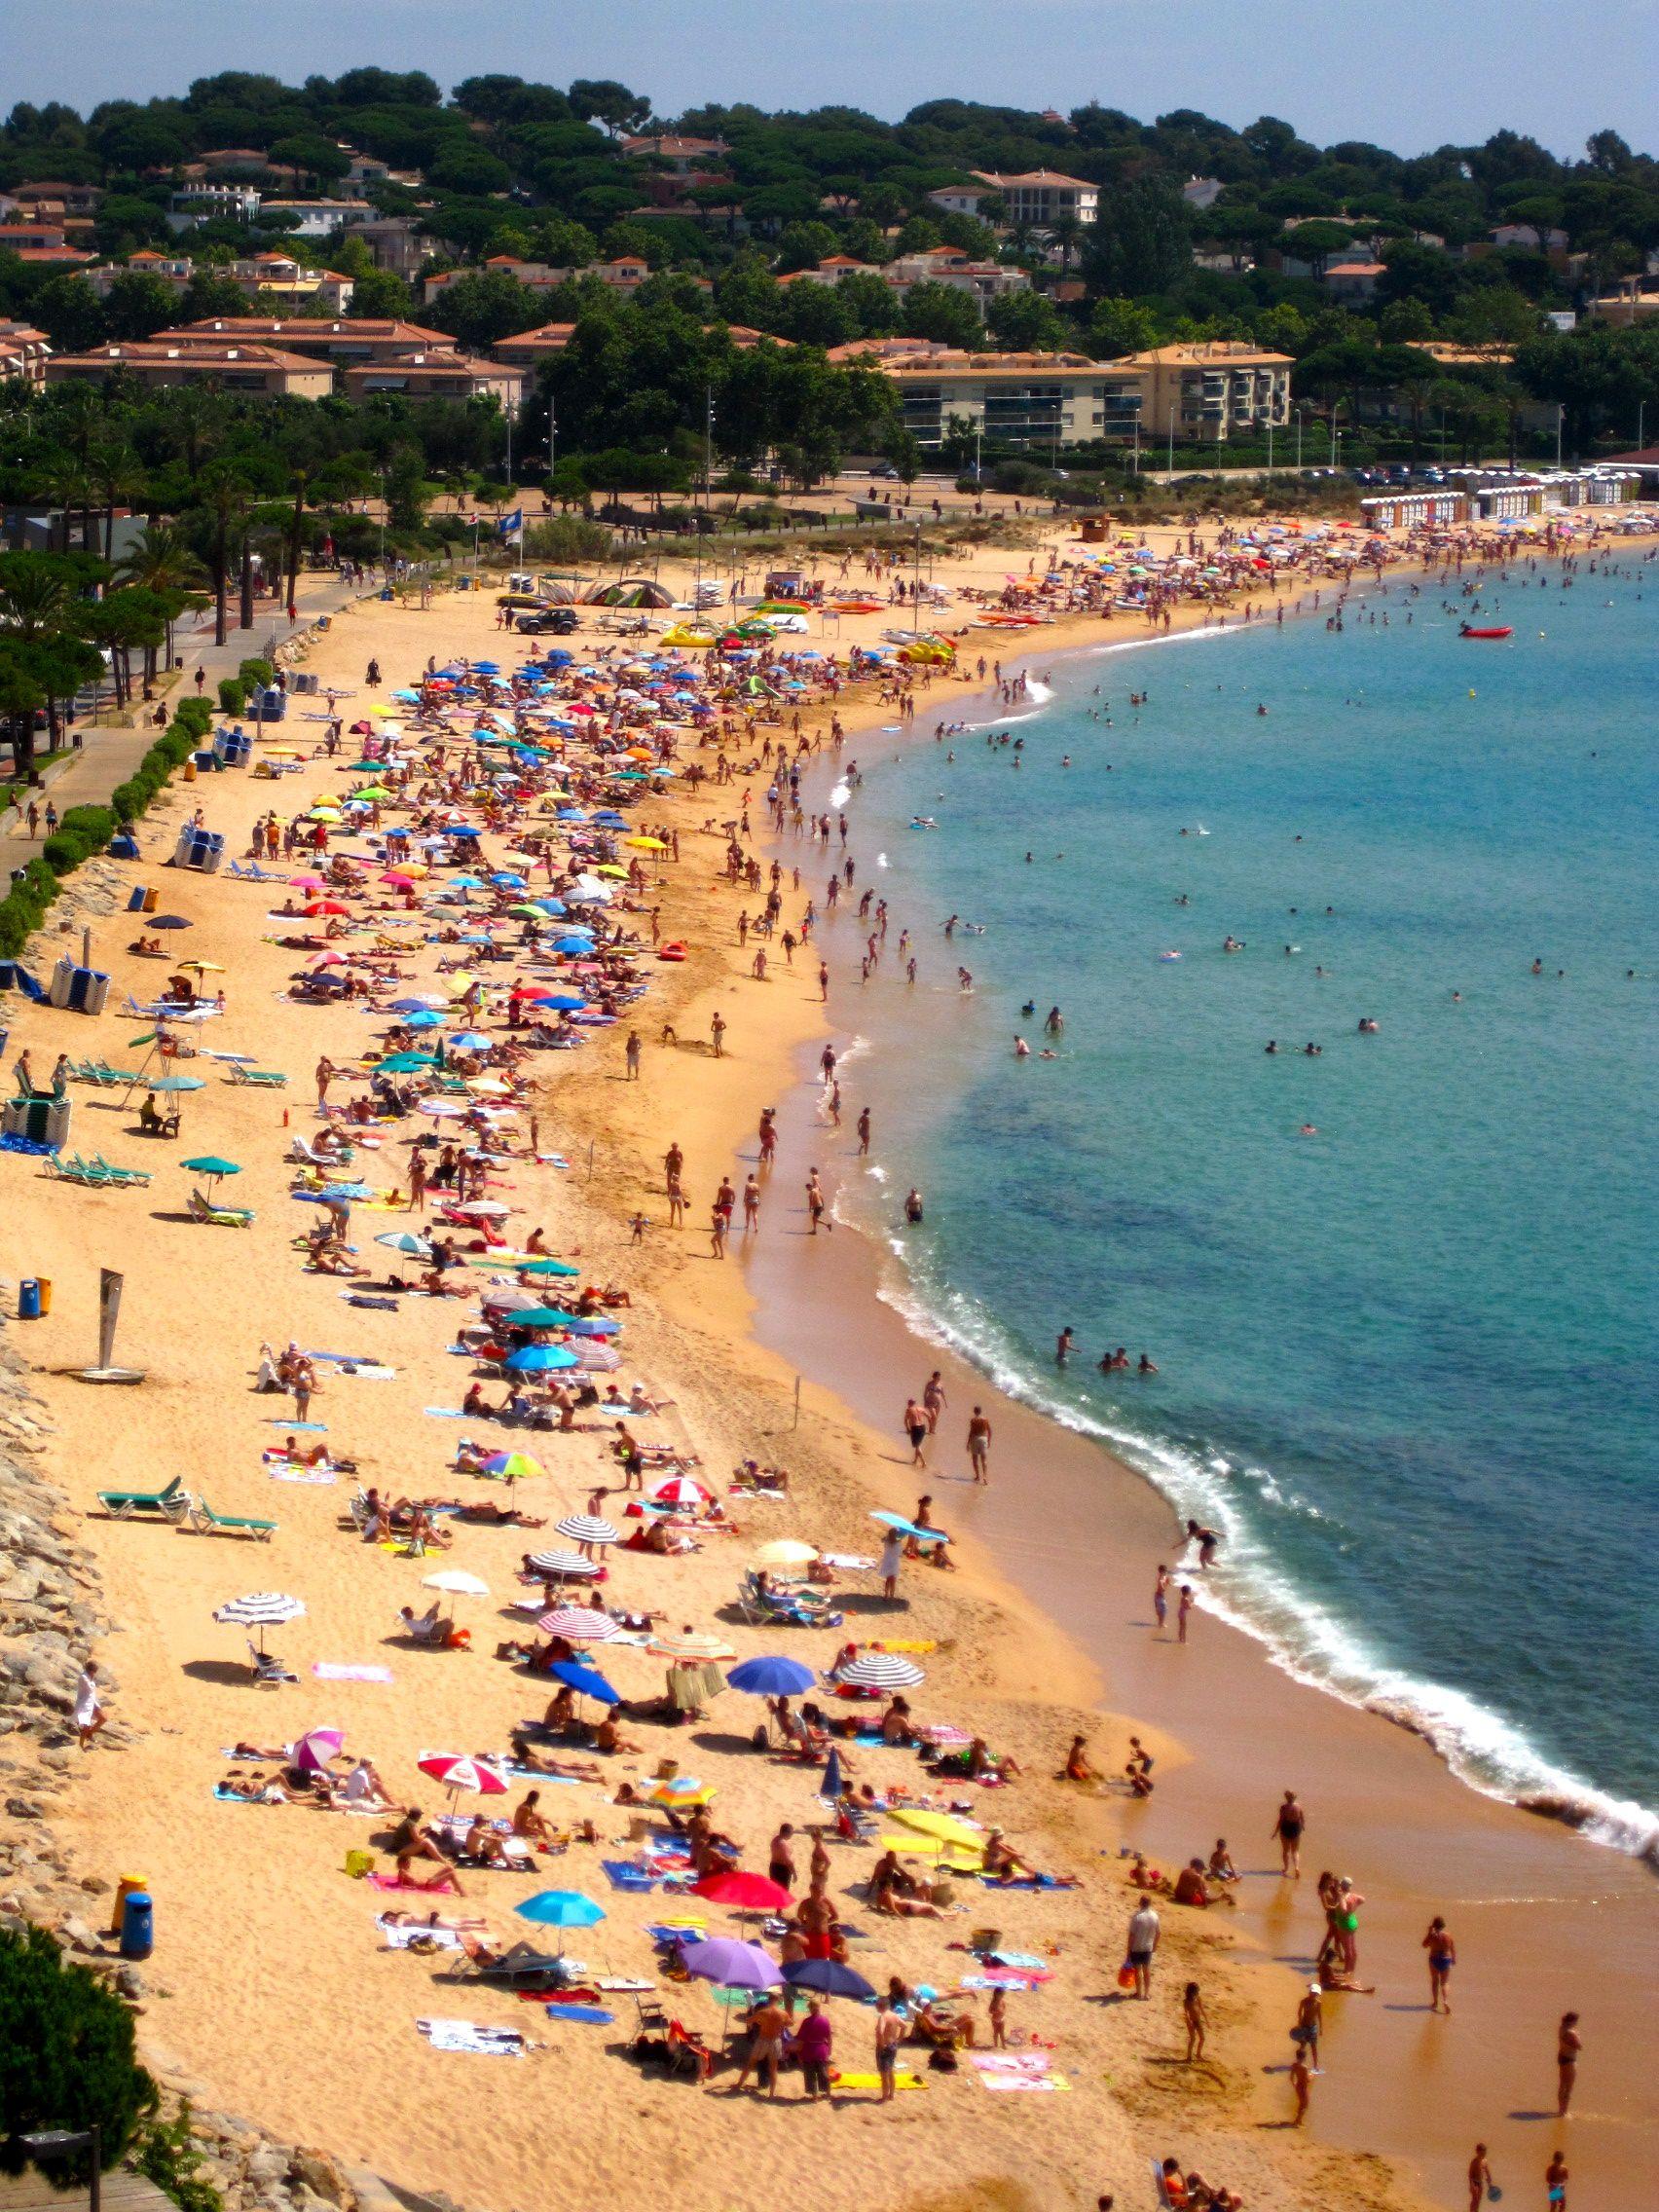 Beach In S Agaro Spain Costa Brava Spain Around The World In 80 Days Spain